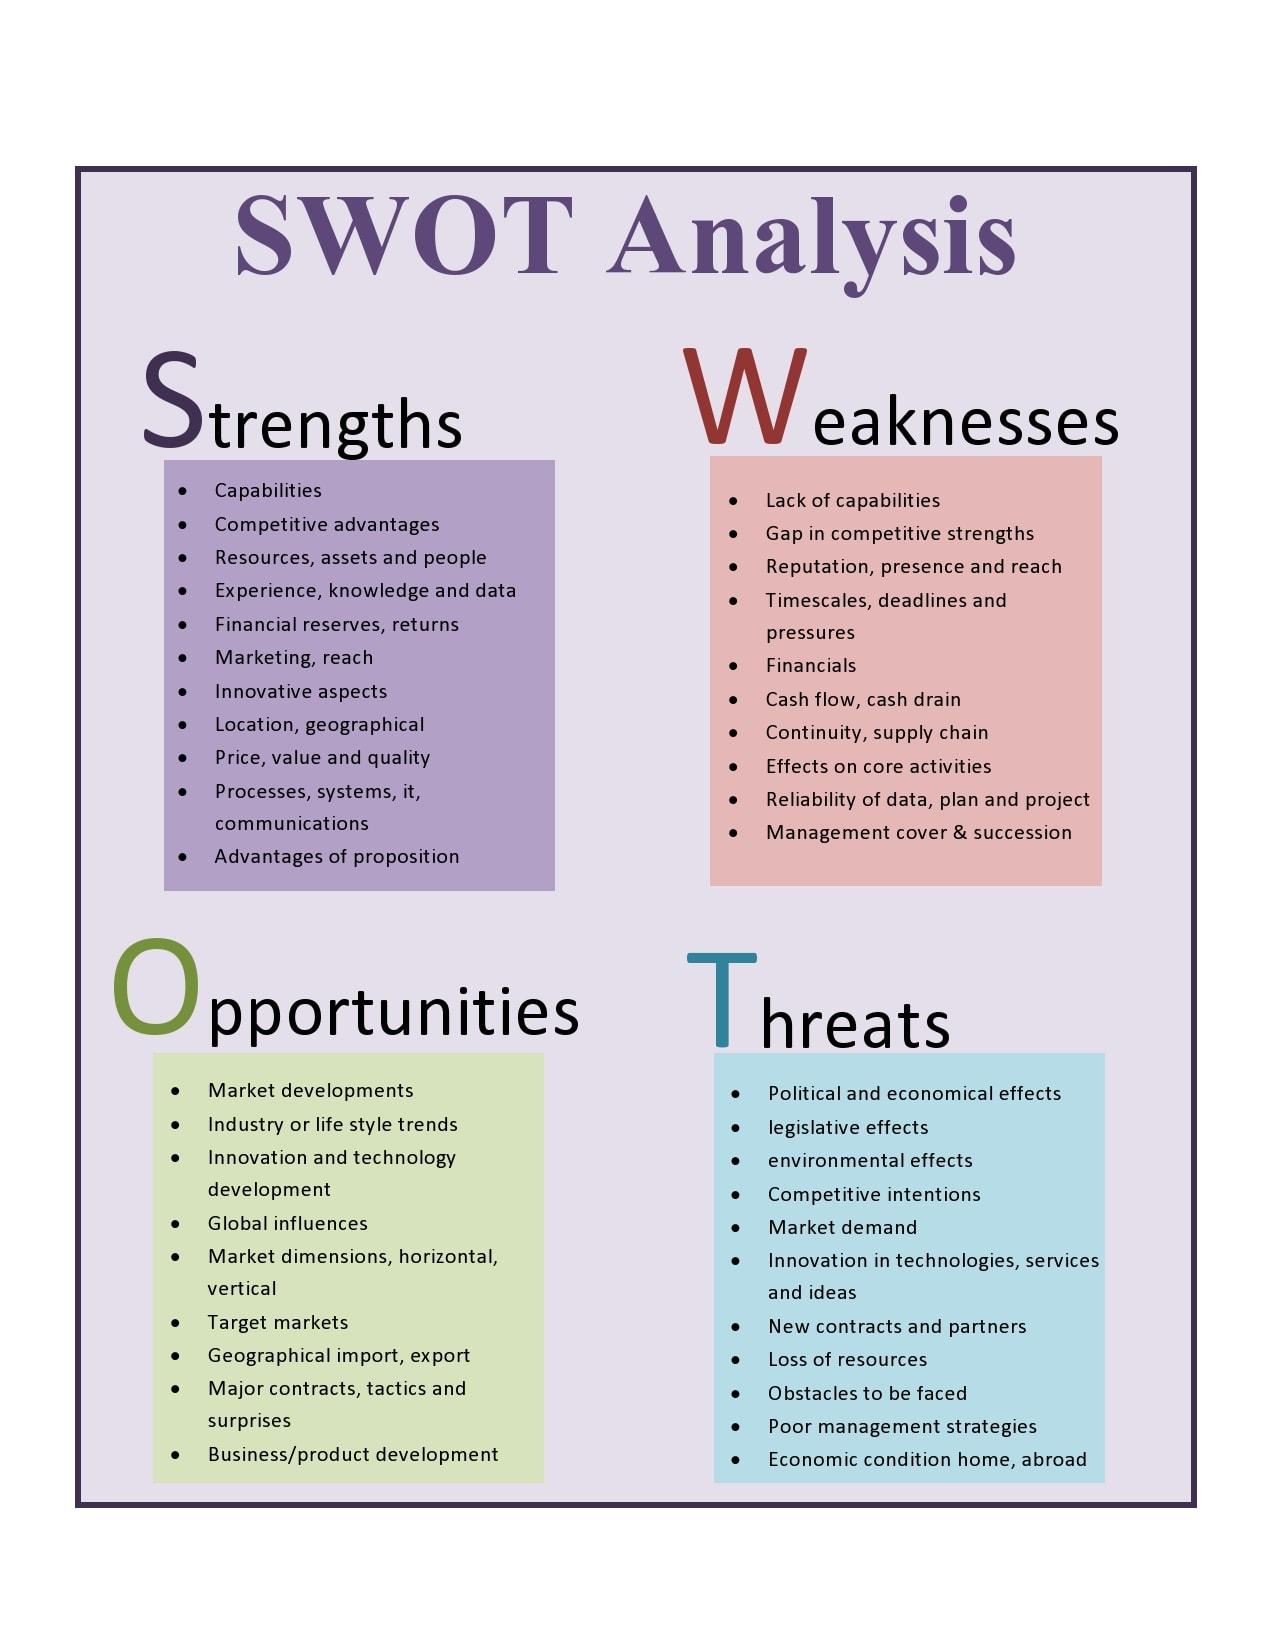 swot analysis template 11